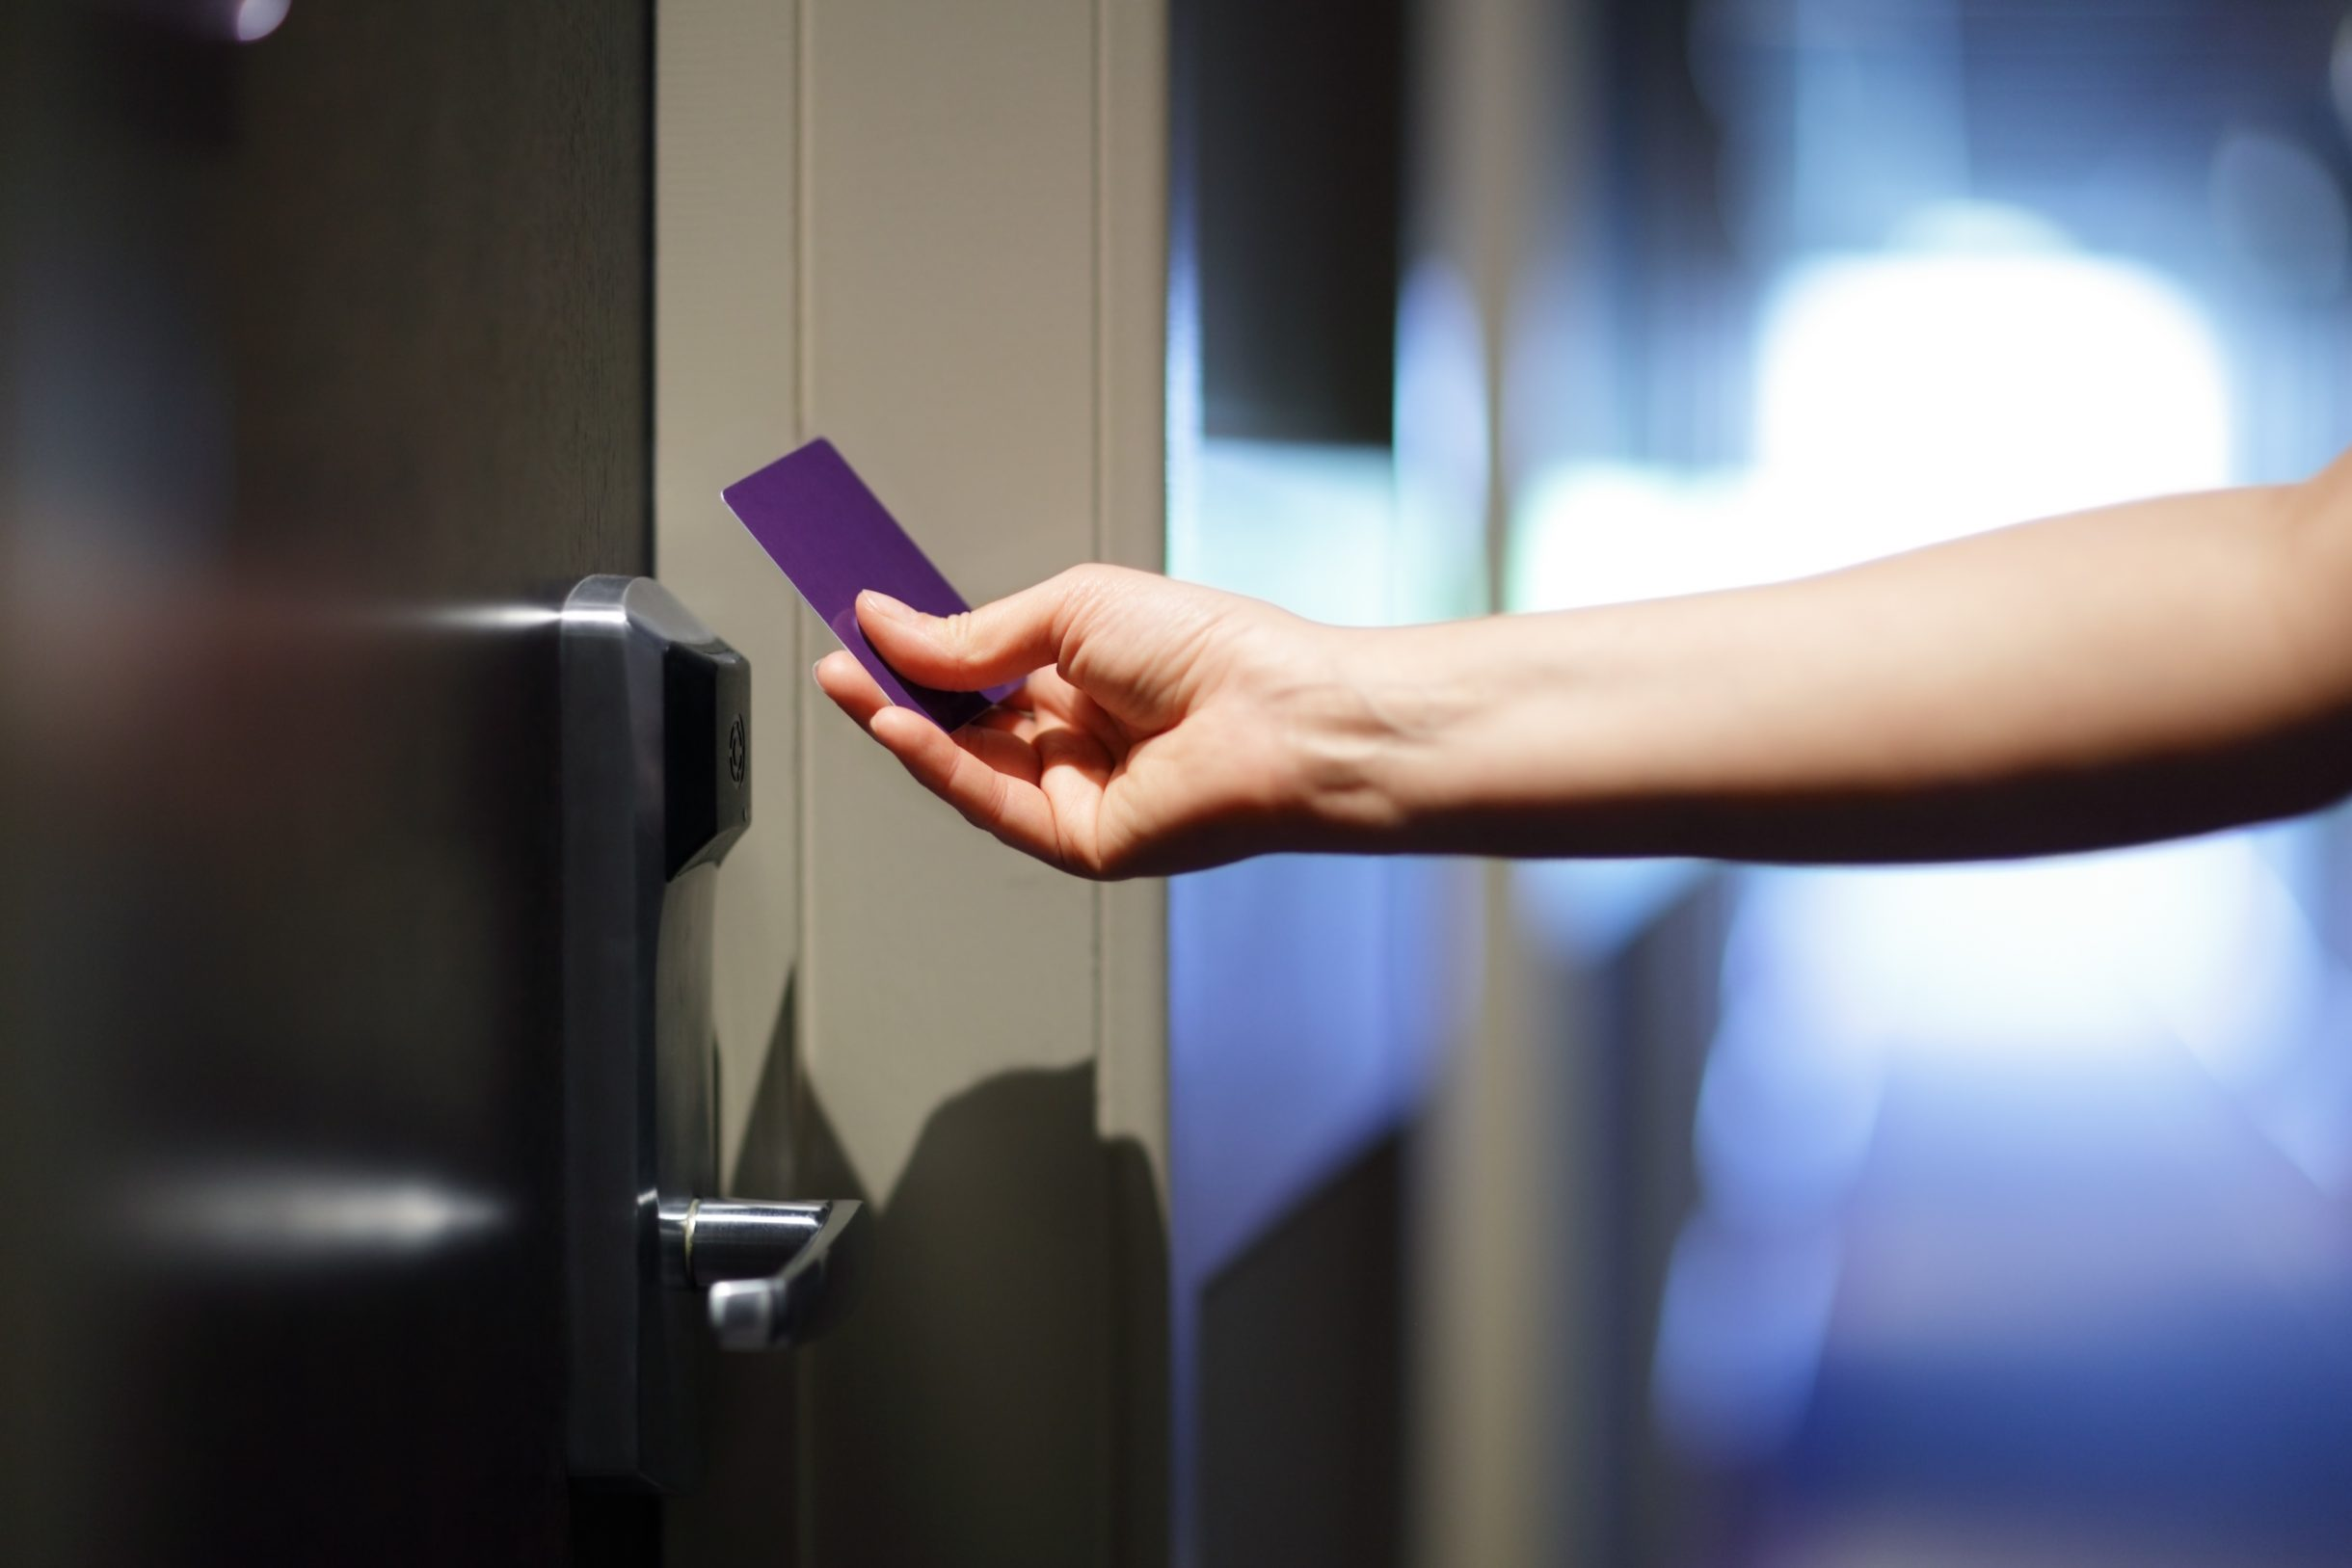 Smart Lock Bild 3 Opening a hotel door with keyless entry card